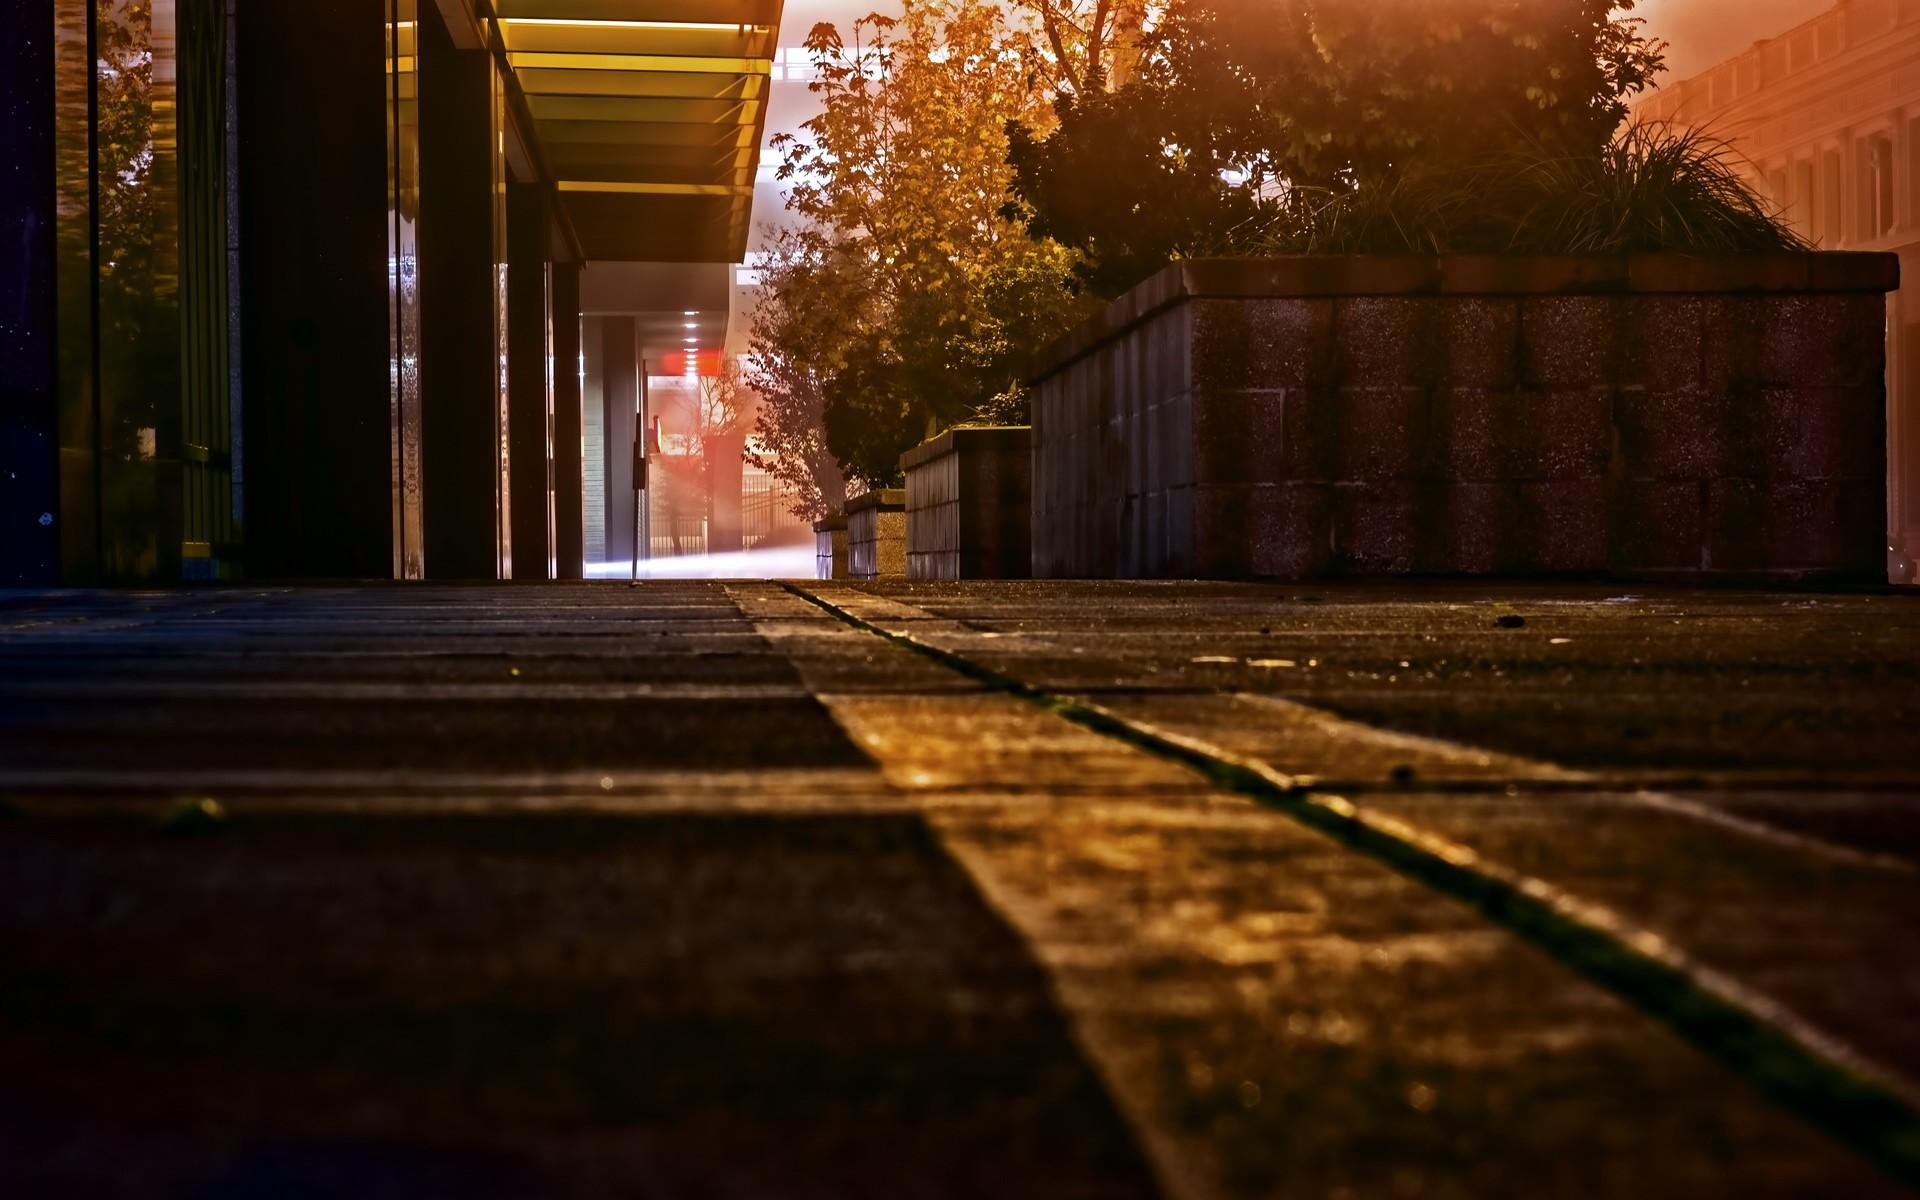 11 Excellent HD Sidewalk Wallpapers